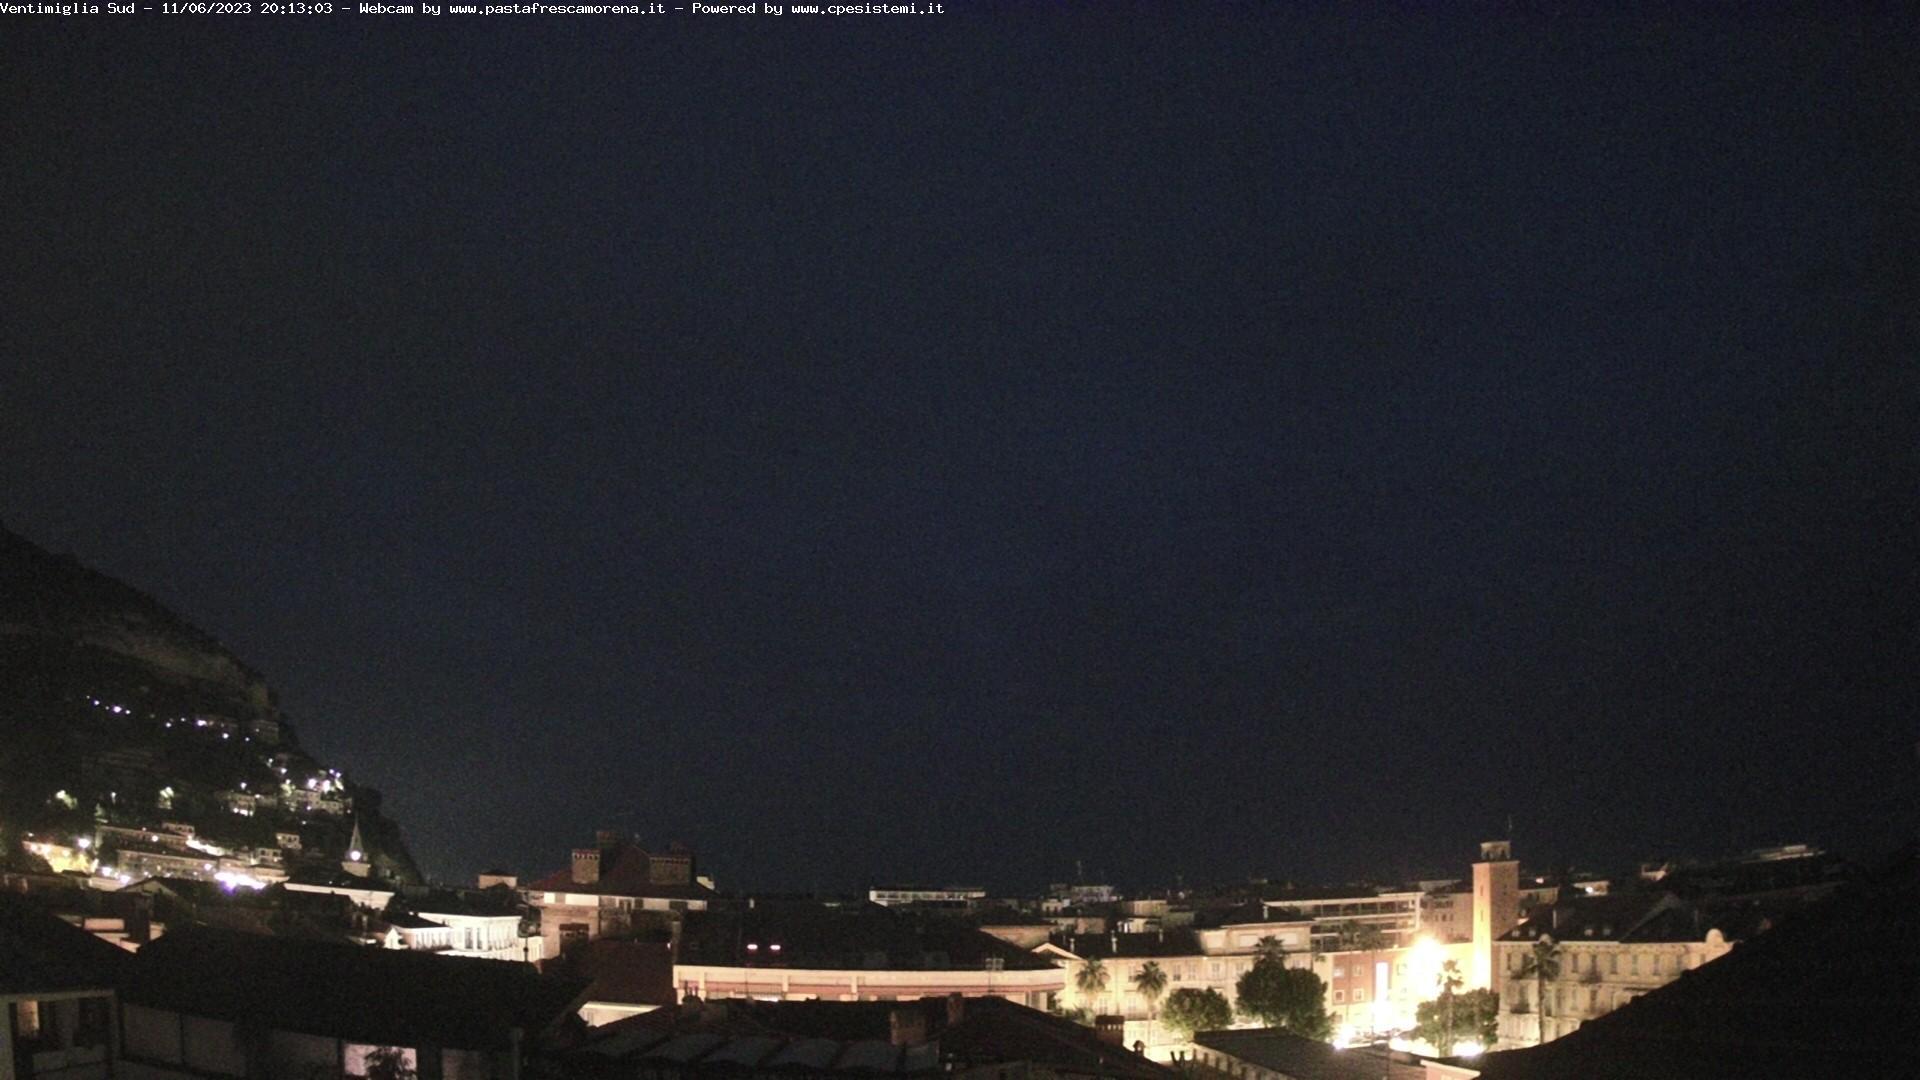 Webcam Ventimiglia Sud